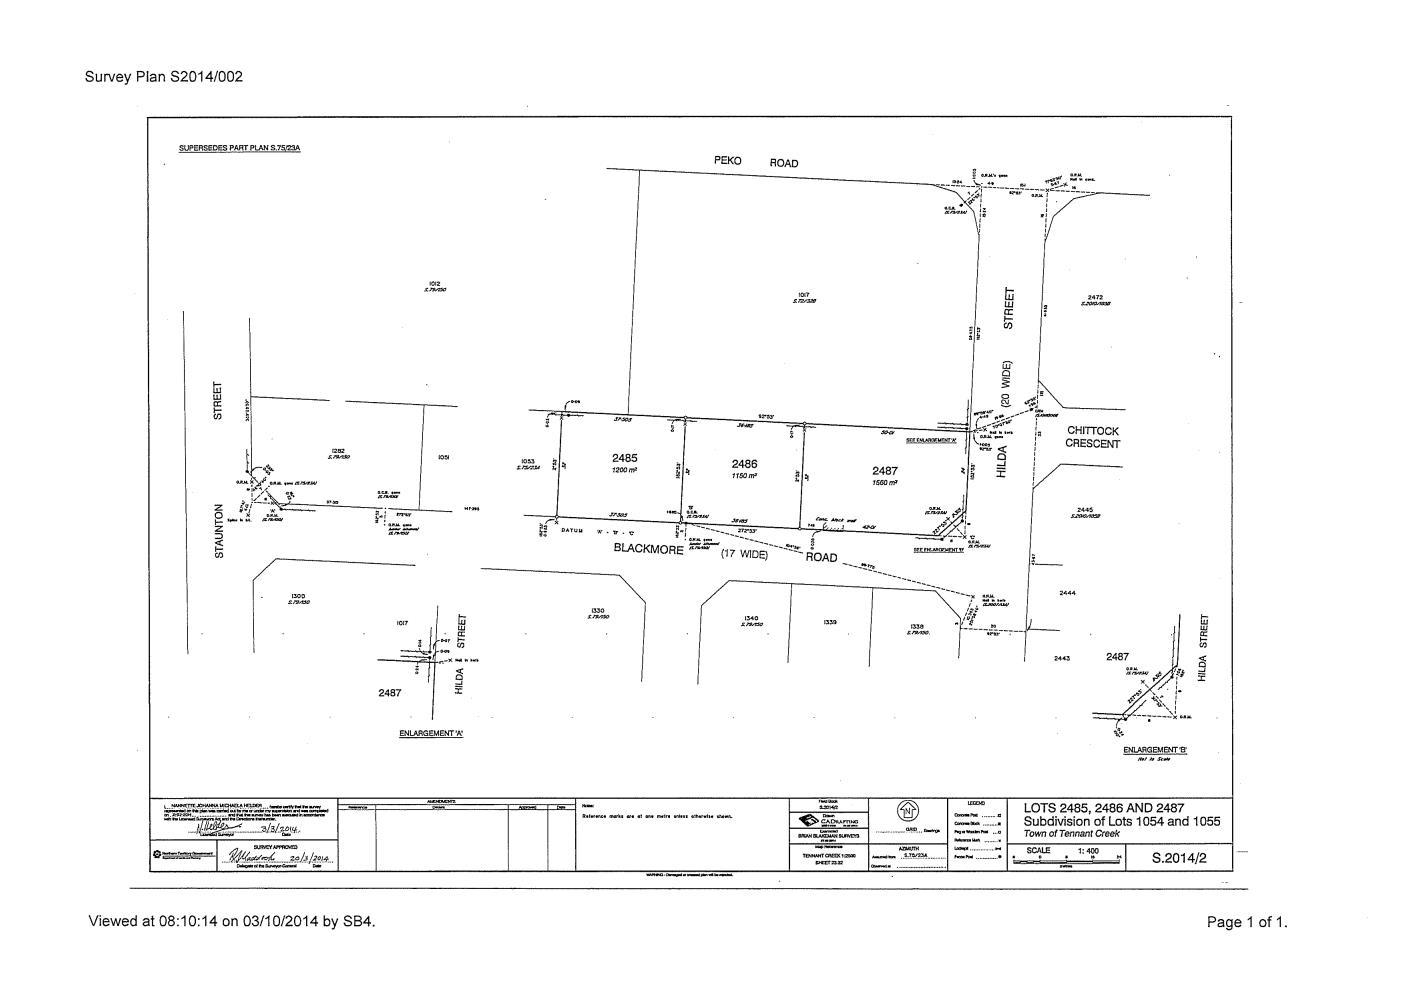 15 Chittock Crescent TENNANT CREEK NT 860 Andrews Property